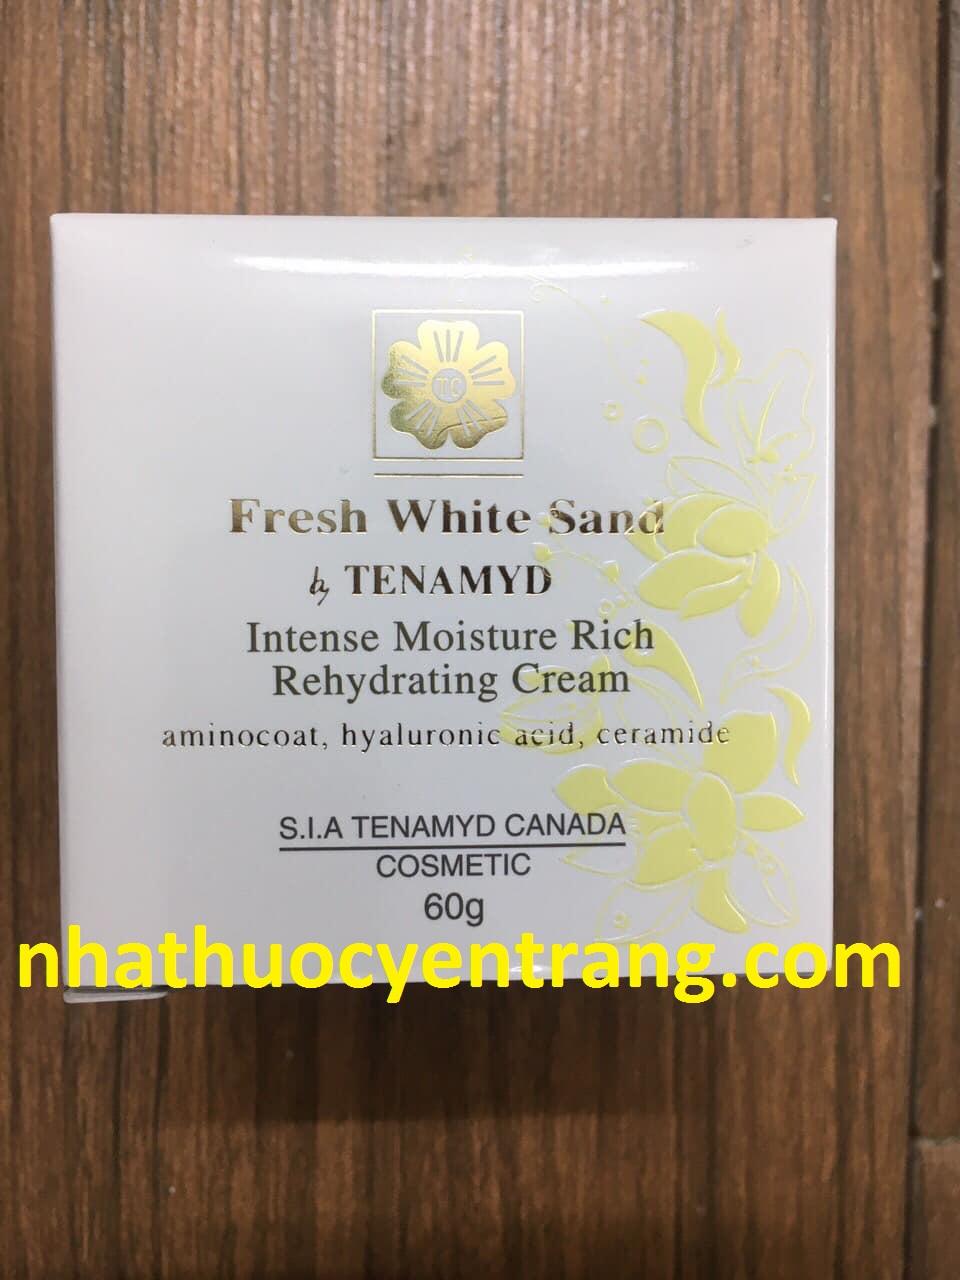 Kem dưỡng Tenamyd Intense Moisture Rich Rehydrating Cream